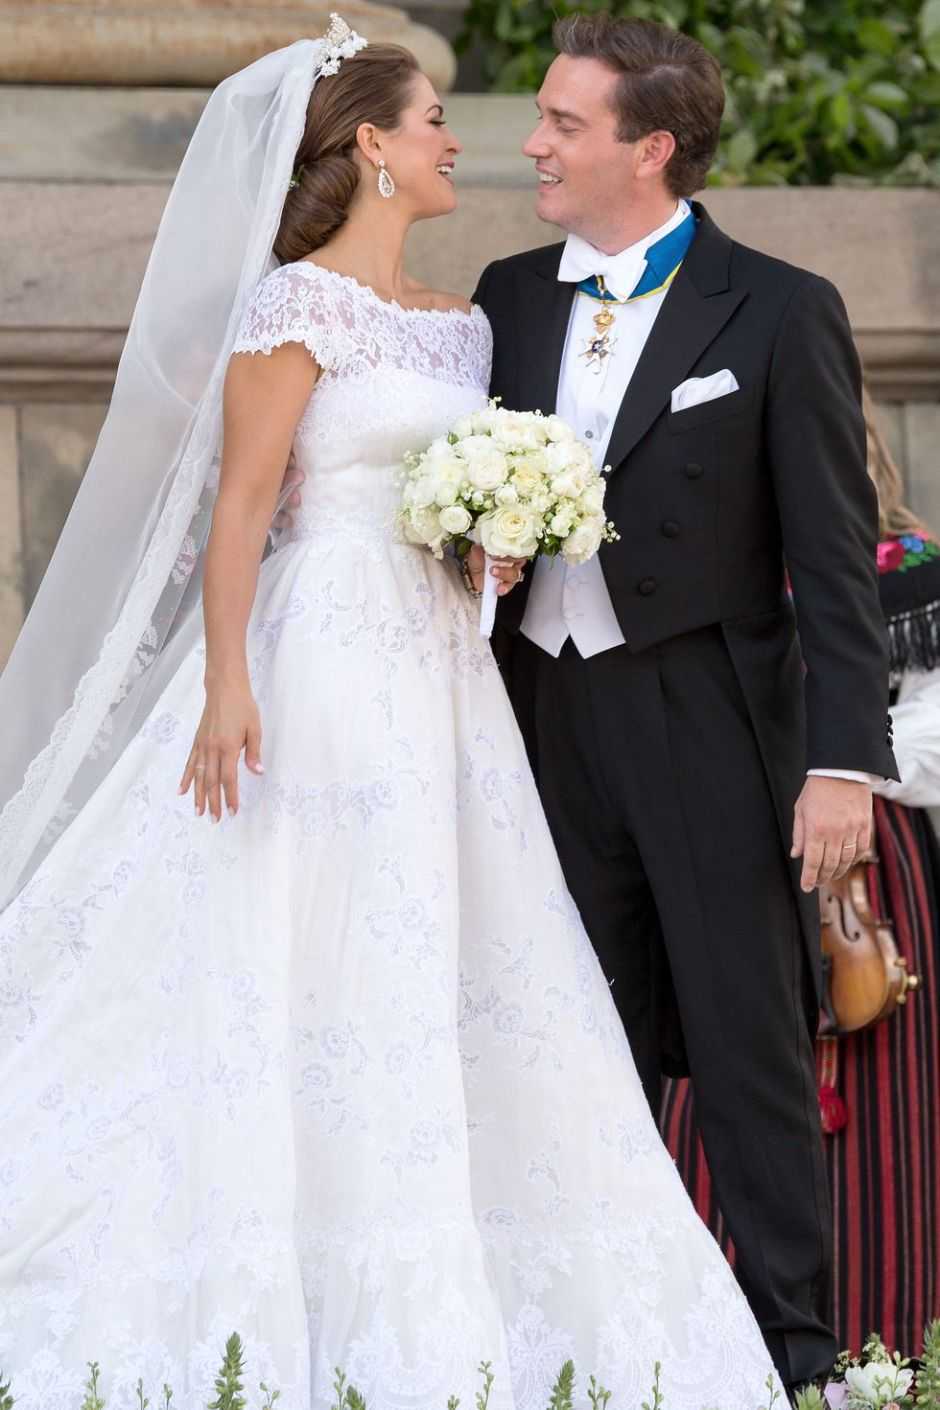 princess-madeleine-and-christopher-o-neill-of-sweden-wedding-dress-1516608320